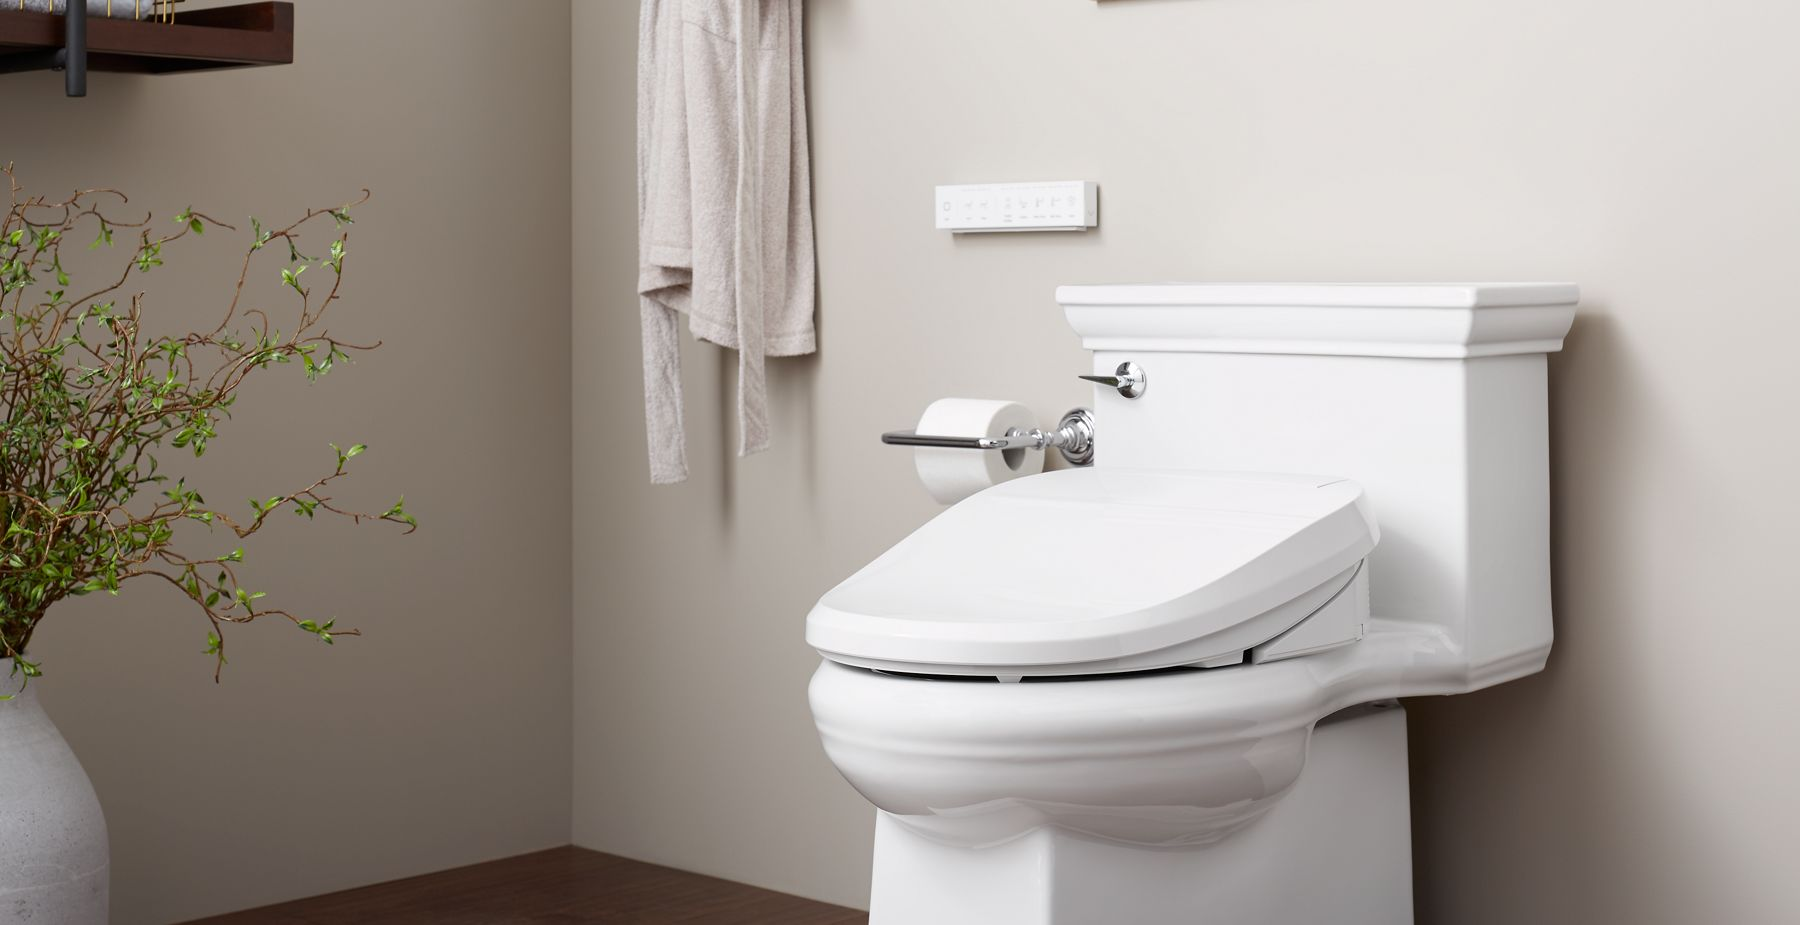 Memilih Toilet Duduk